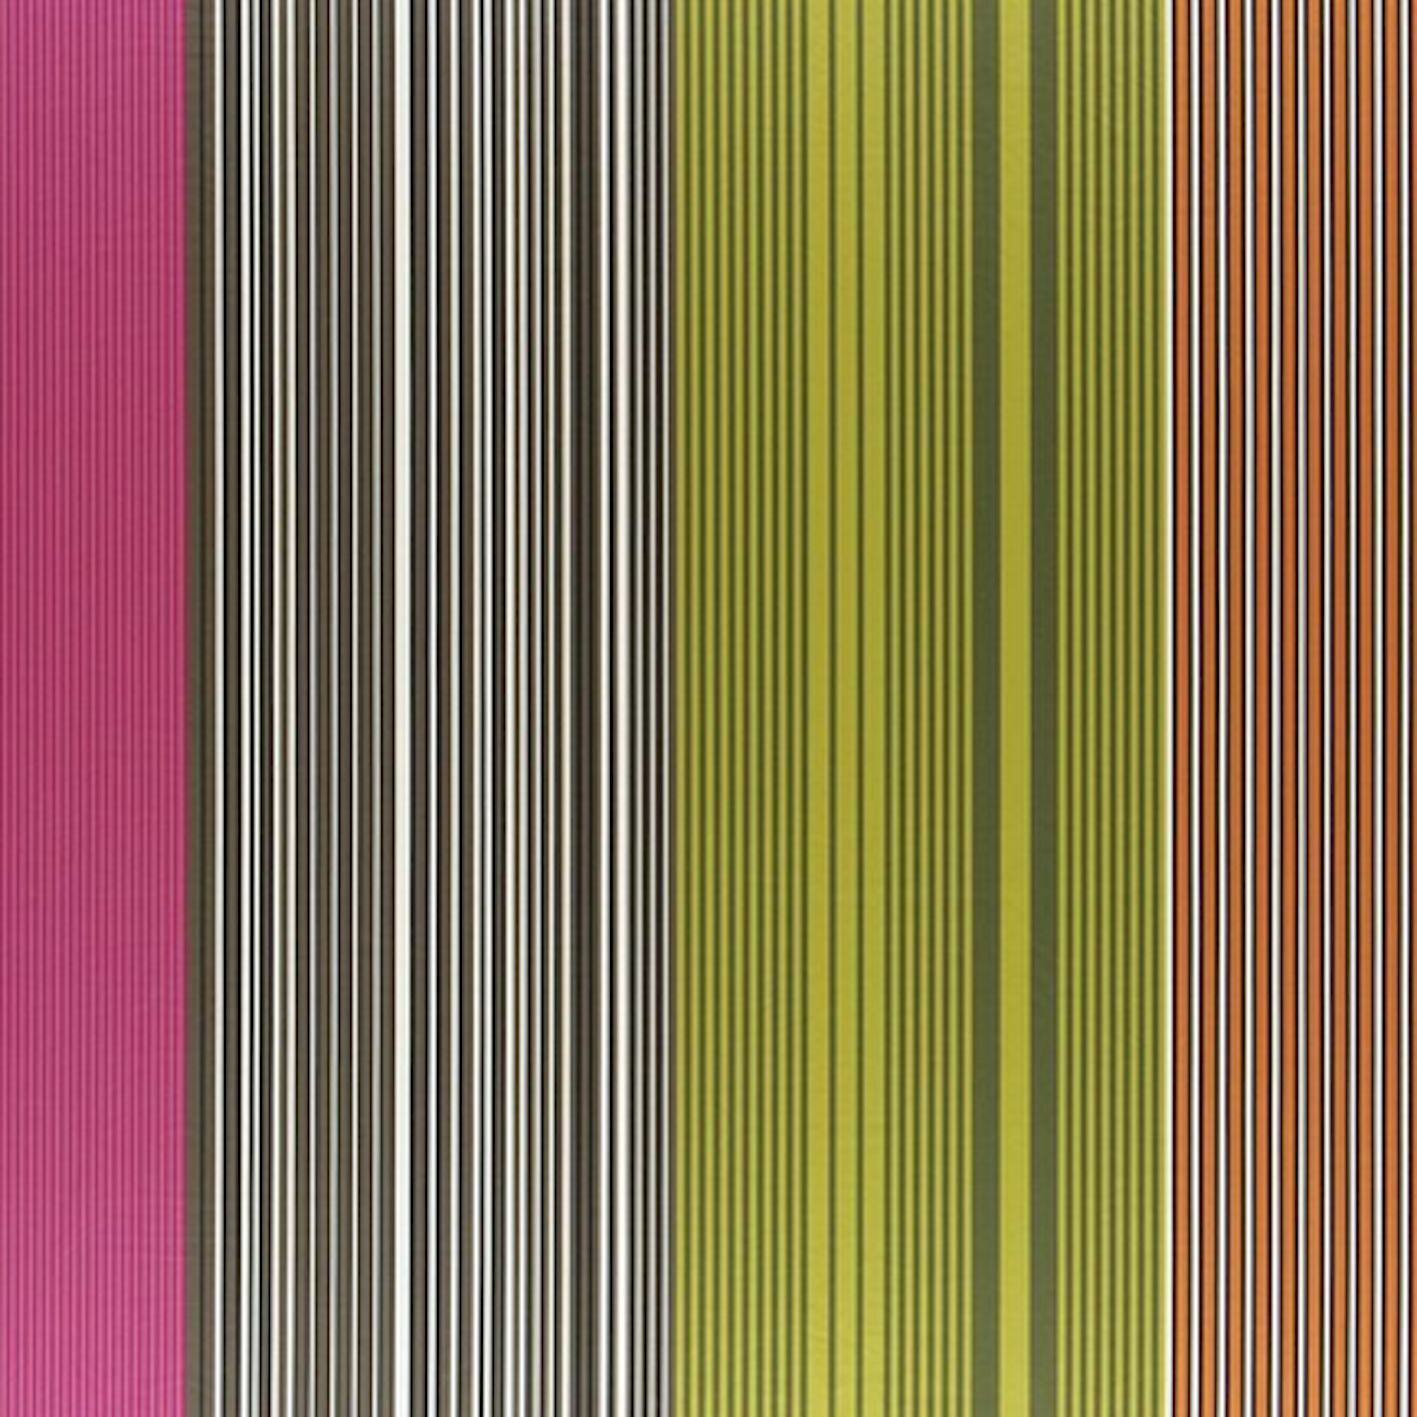 DESIGNERS GUILD FABRIC DELPHI PEONY TURQUOISE COTTON SILK MIX RETAILS F1960 03